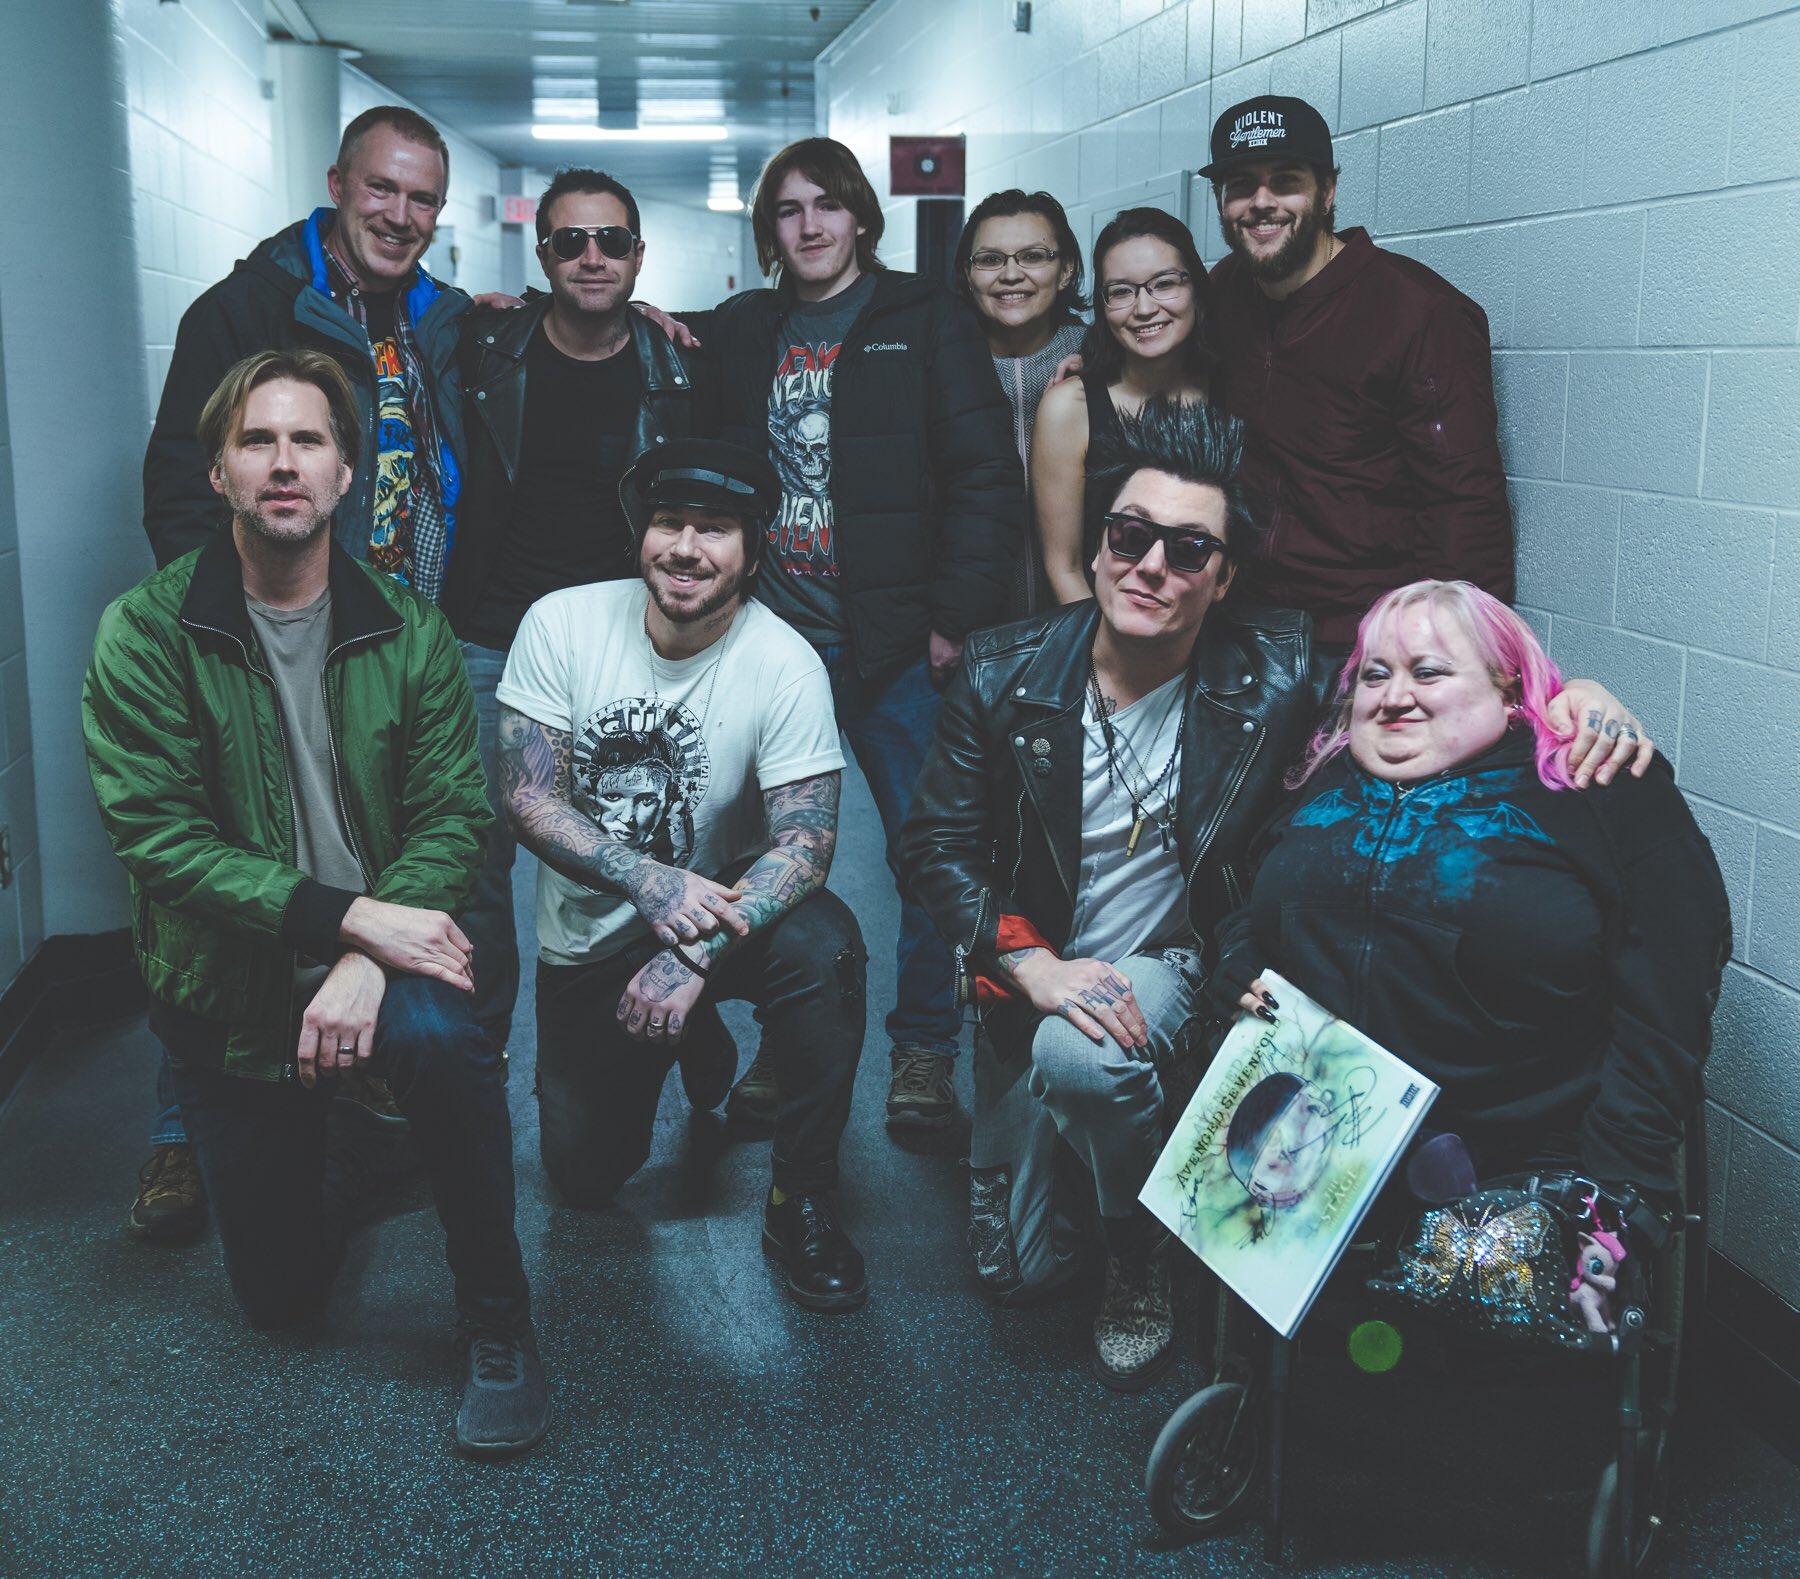 #DeathbatNation Meet and Greet - Saskatoon #thestageworldtour #avengedsevenfold ��:@rafacore https://t.co/47zz5NBd3U